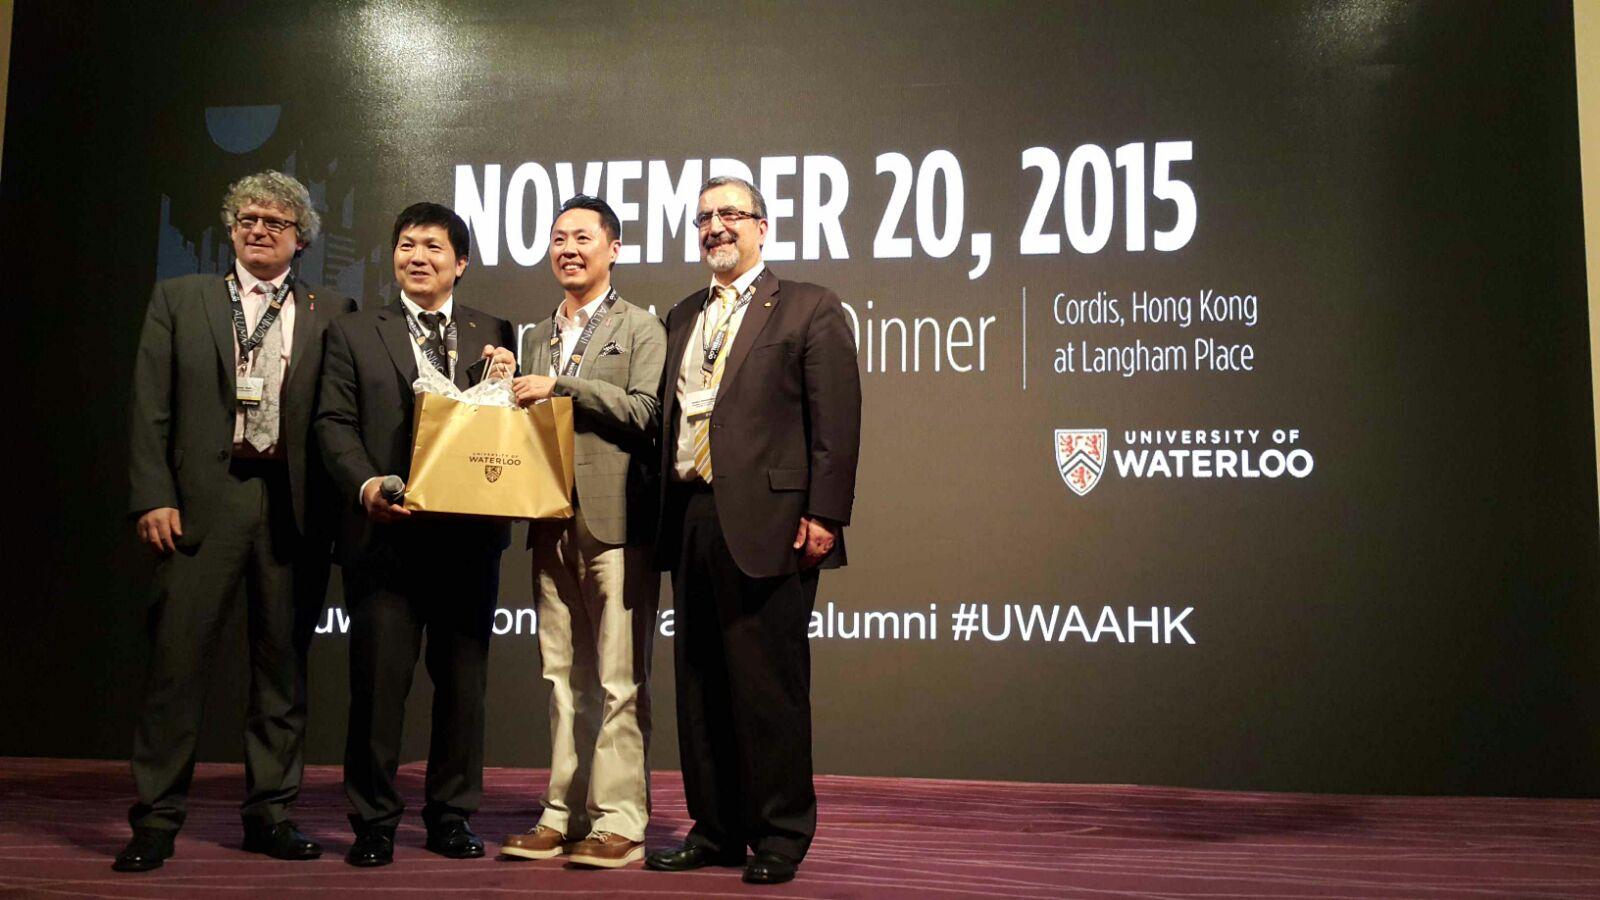 President Feridun Hamdullahpur presenting a gift at the annual Hong Kong dinner.